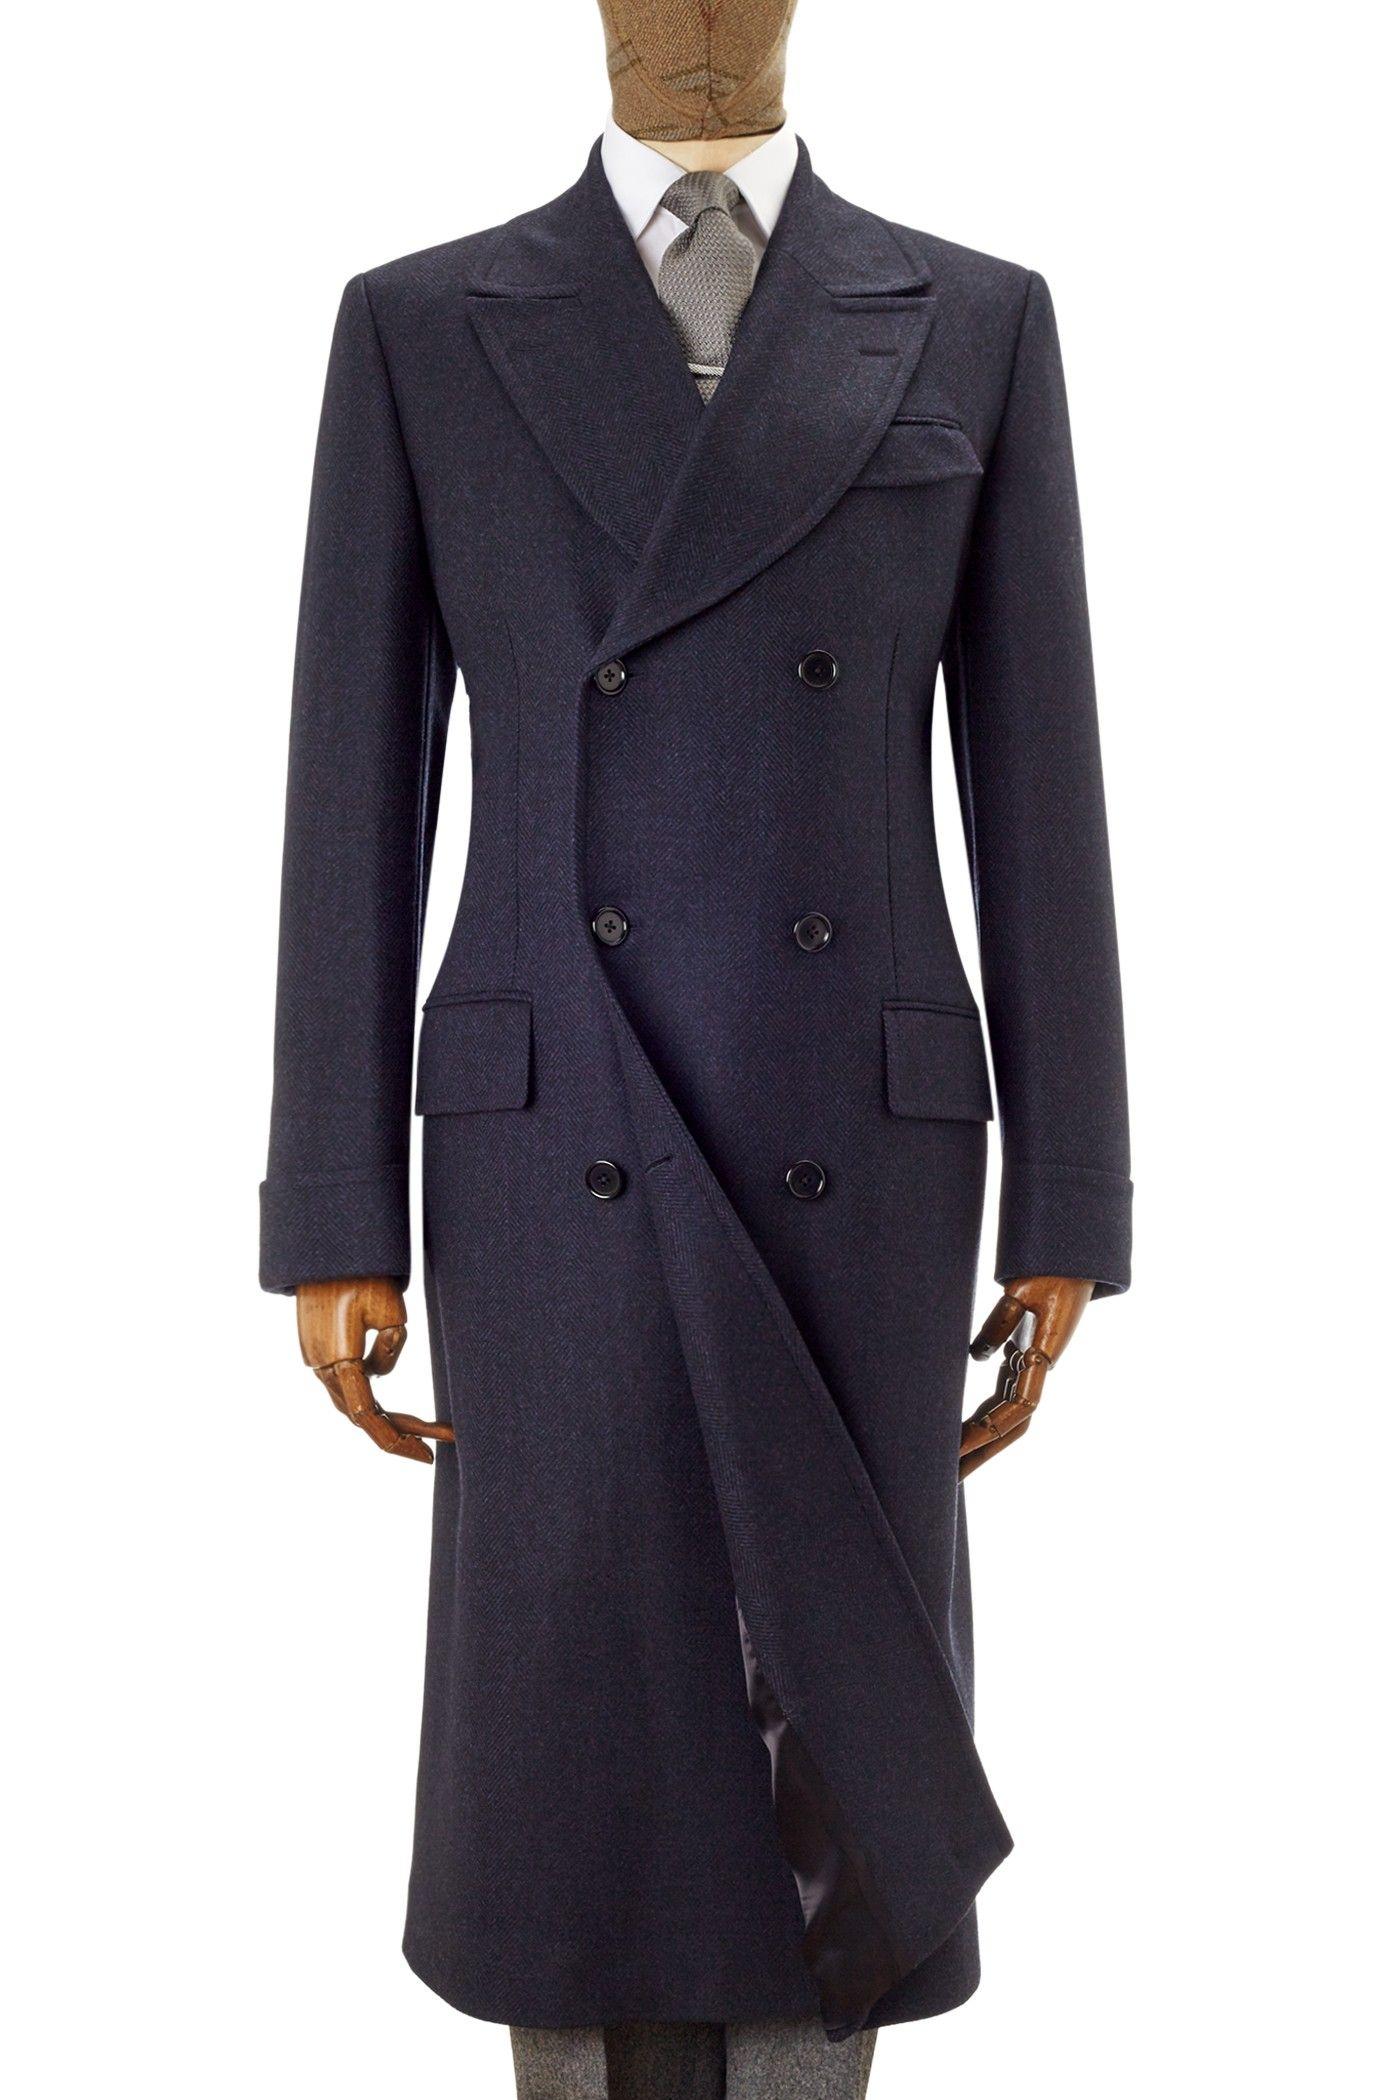 Armstrong Herringbone Coat Navy British Pounds Designer Clothes For Men Mens Dress Coats Mens Clothing Styles [ 2100 x 1400 Pixel ]